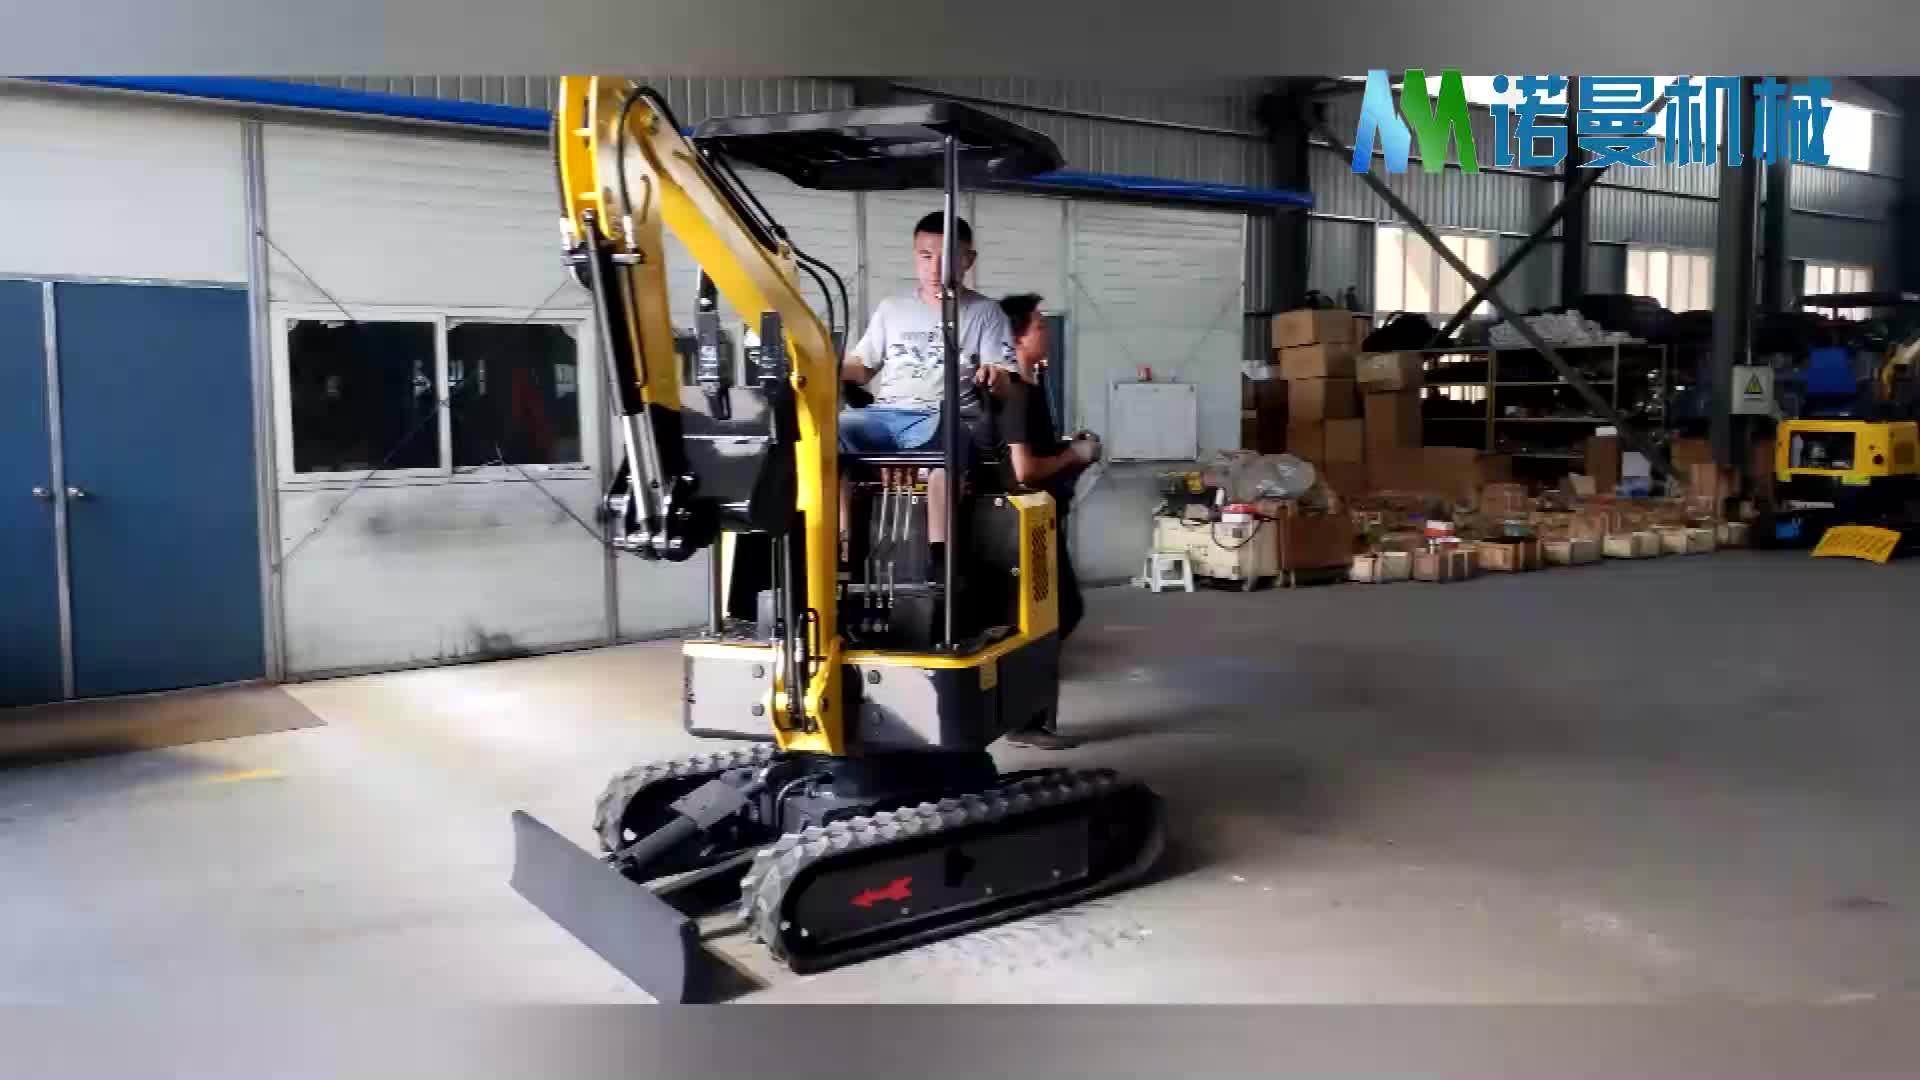 O envio gratuito de Hidráulica piloto joystick mini pelle/bagger/digger escavadeira equipado 3 3TNV70 cilindros refrigerado a água do motor